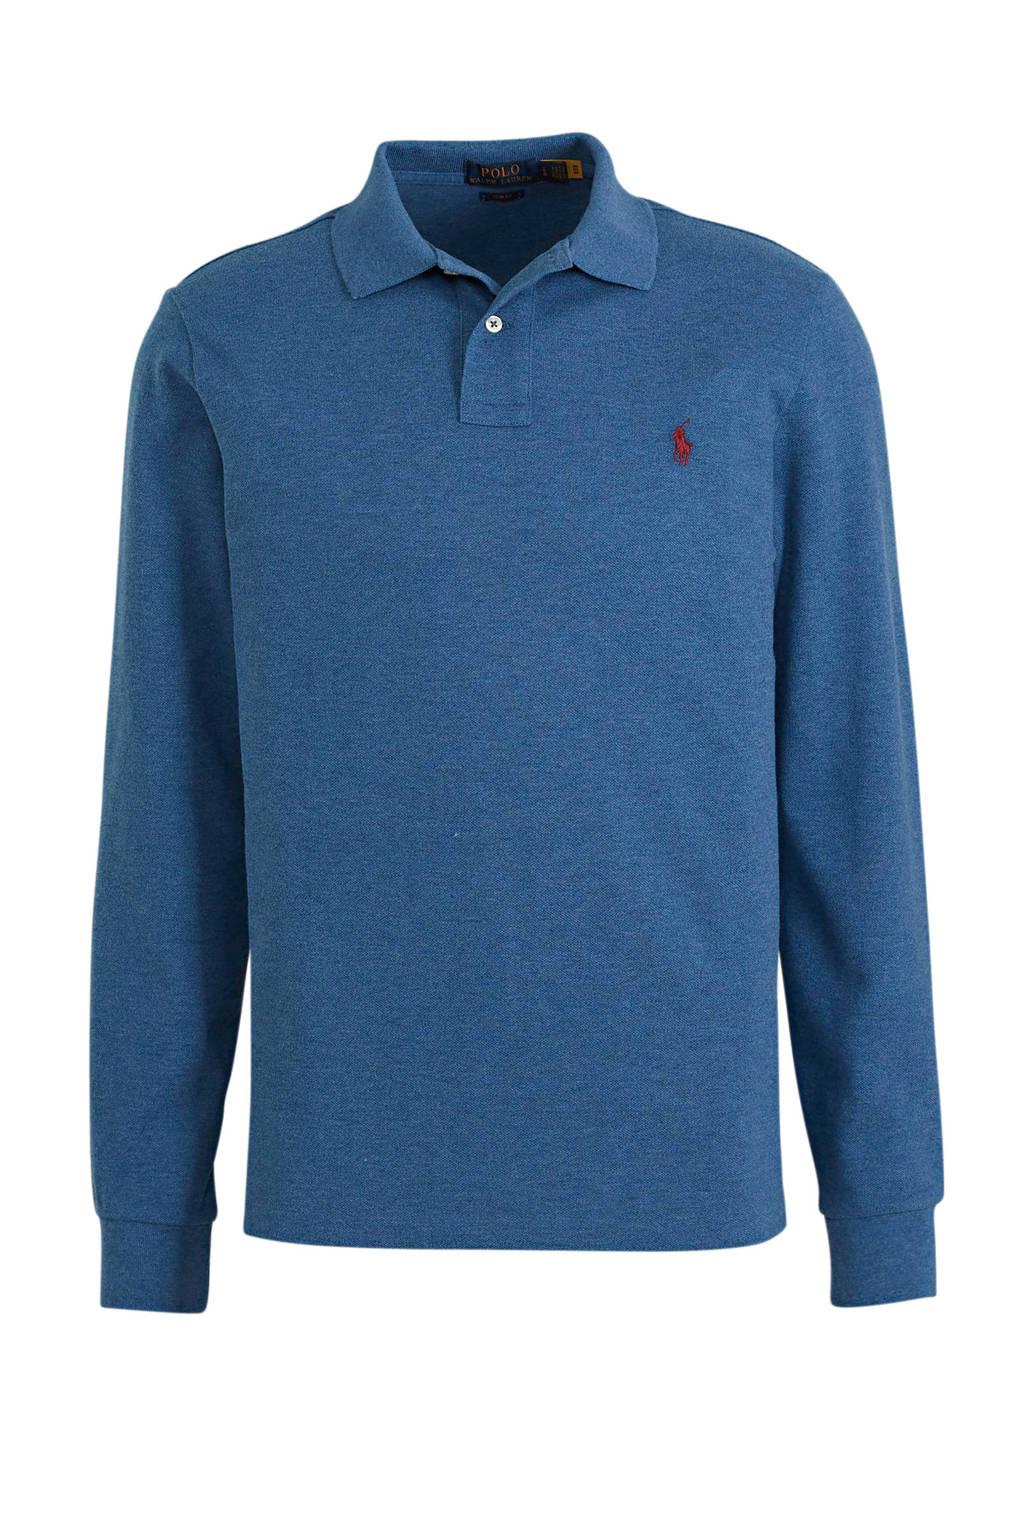 POLO Ralph Lauren regular fit polo blauw, Blauw